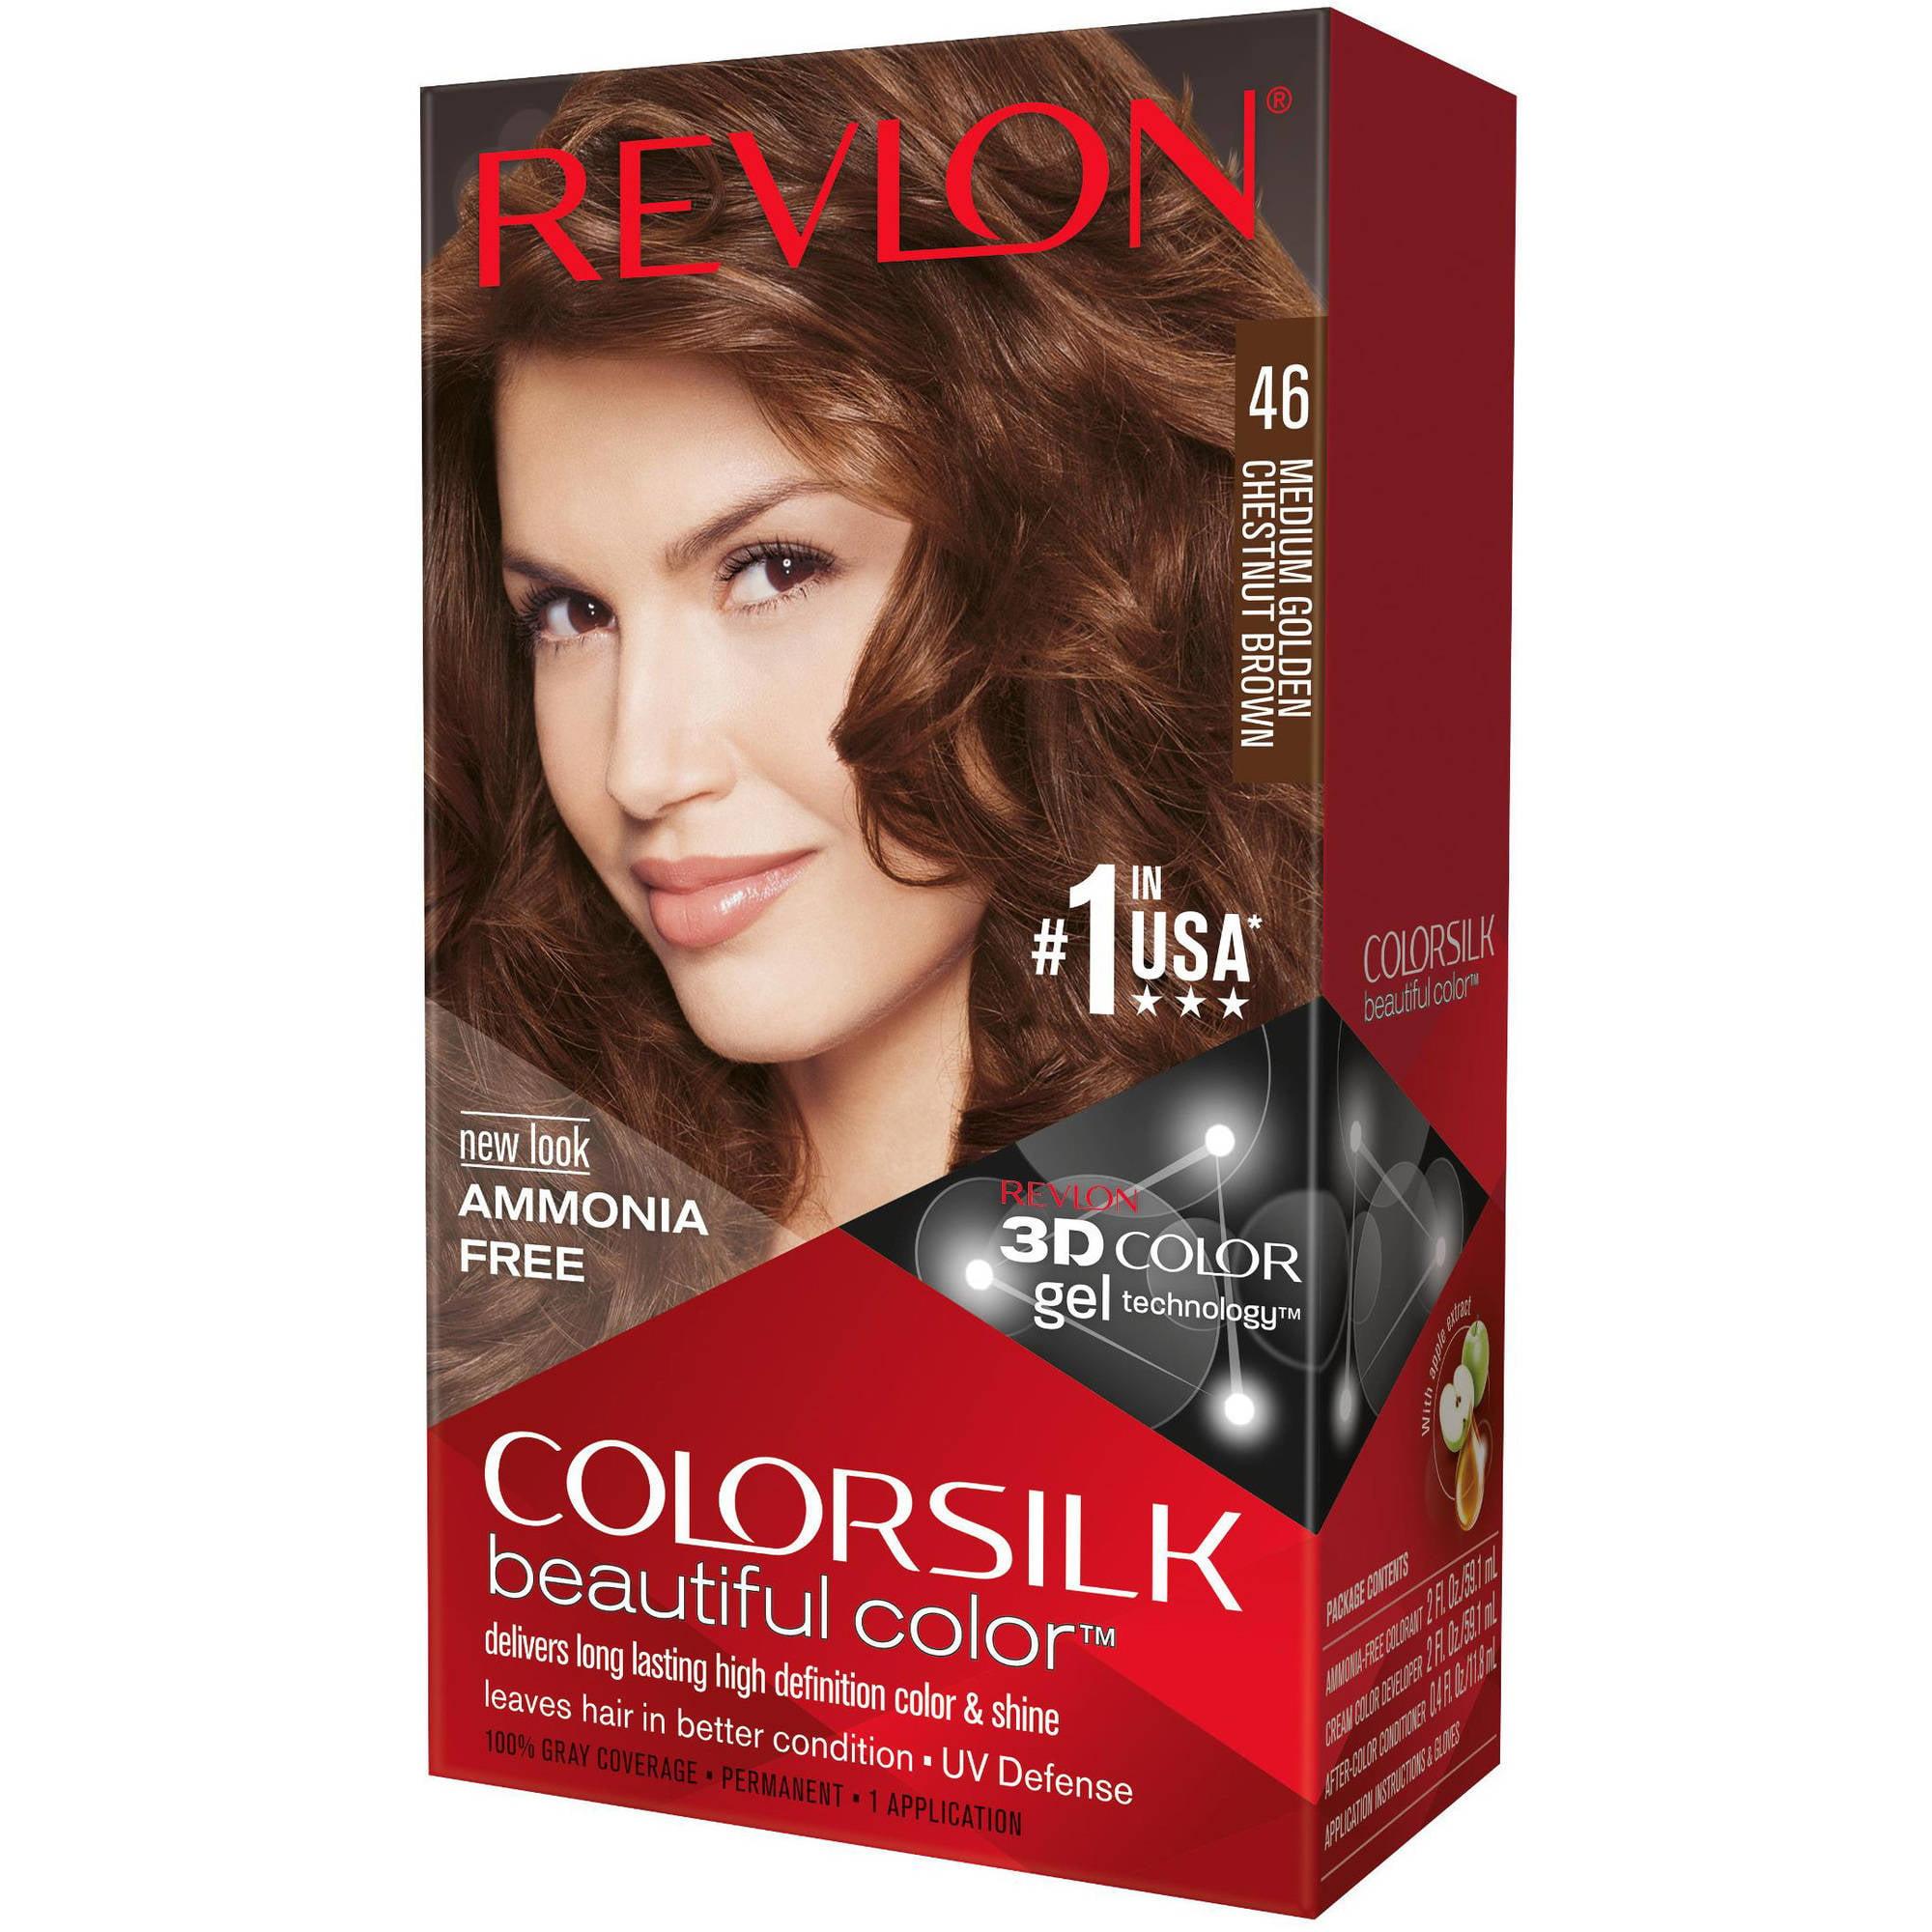 Revlon Colorsilk Permanent Hair Color, Medium Golden Chestnut Brown 46